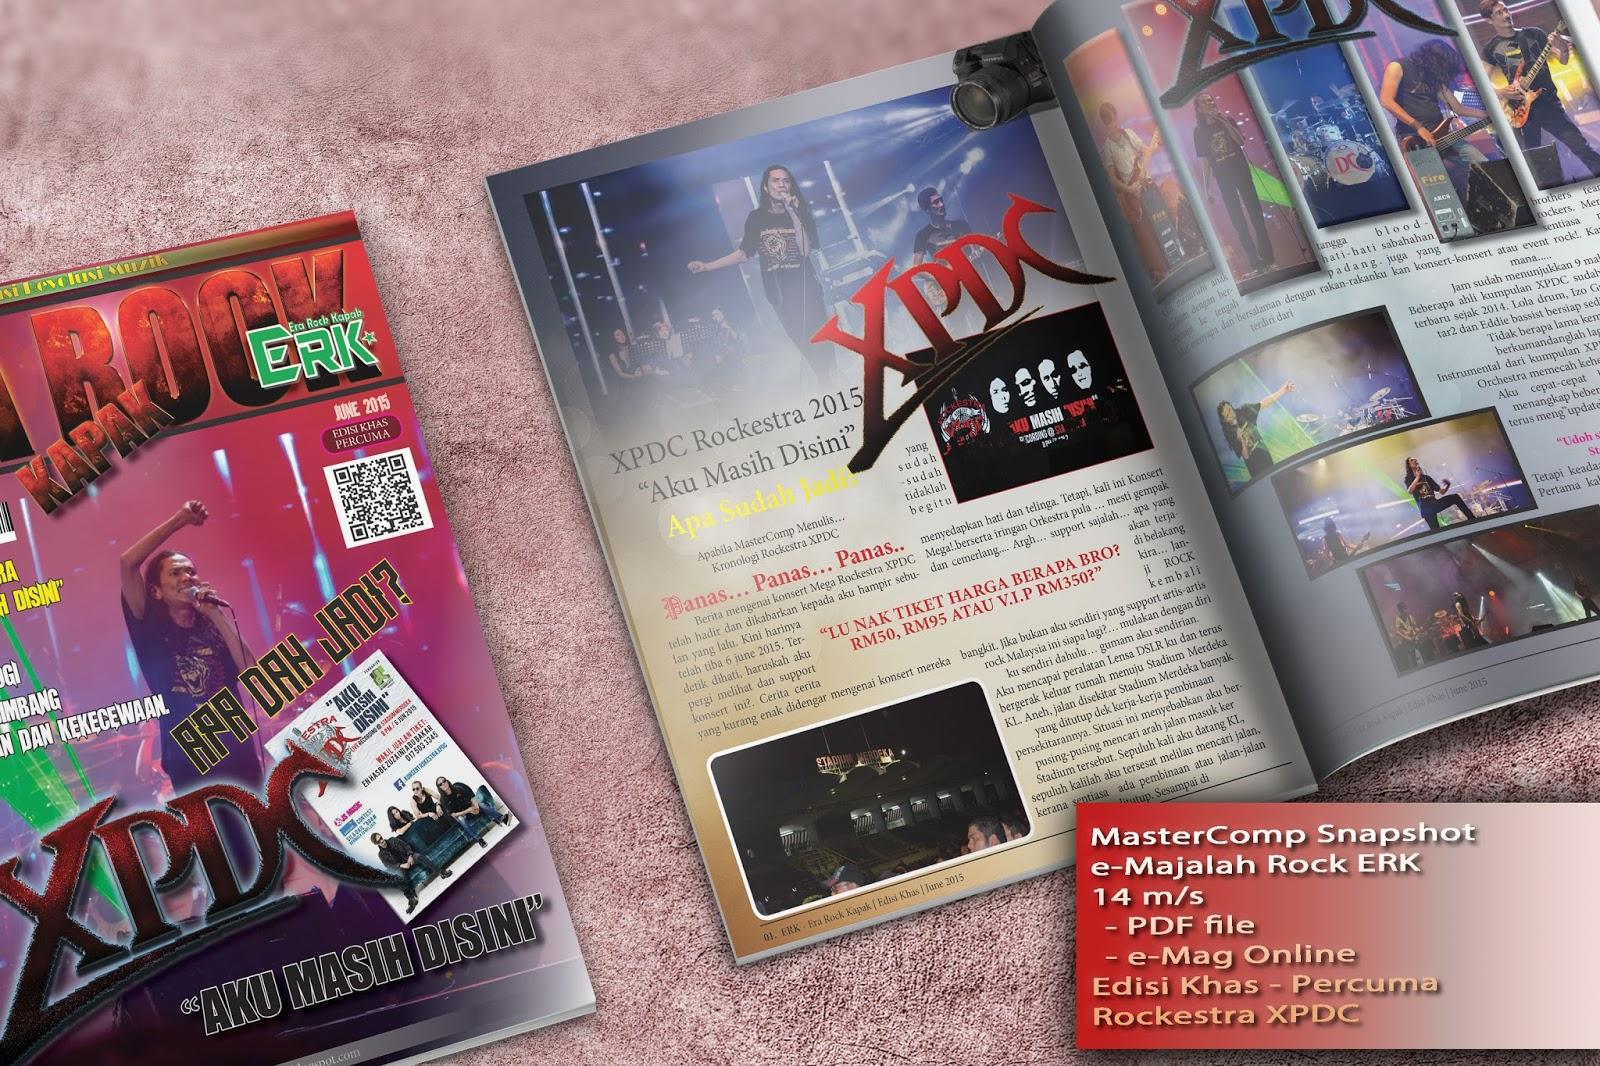 e-Mag - ERK - Rockestra XPDC  Edisi Khas